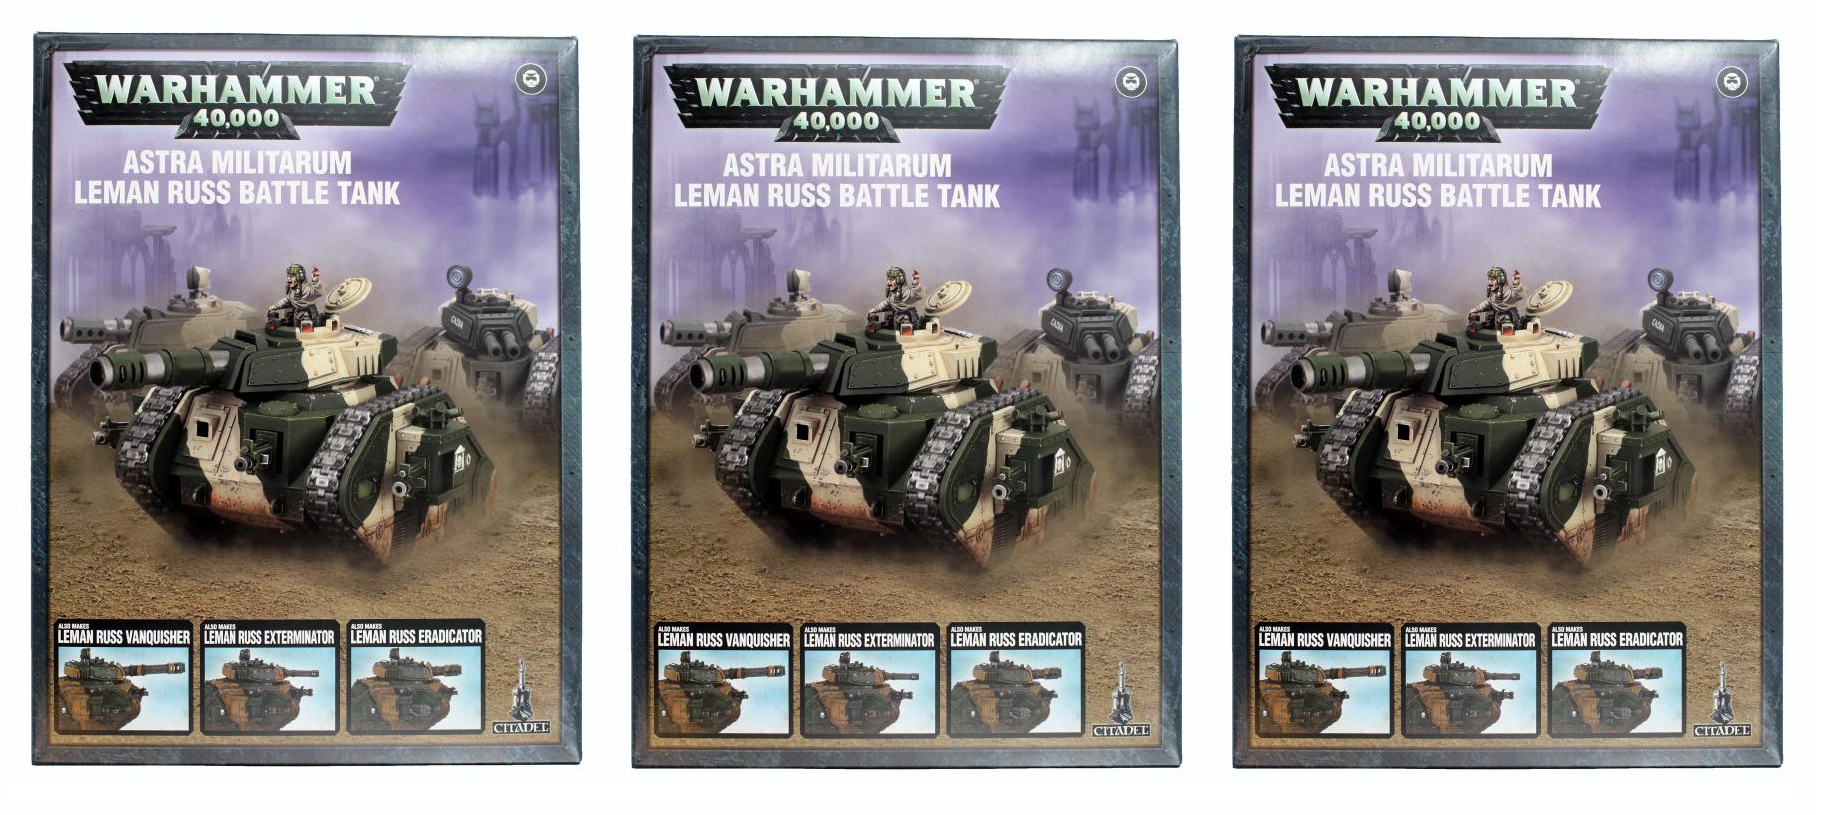 Warhammer 40K Astra Militarum véhicule Accessoire Tank Commander